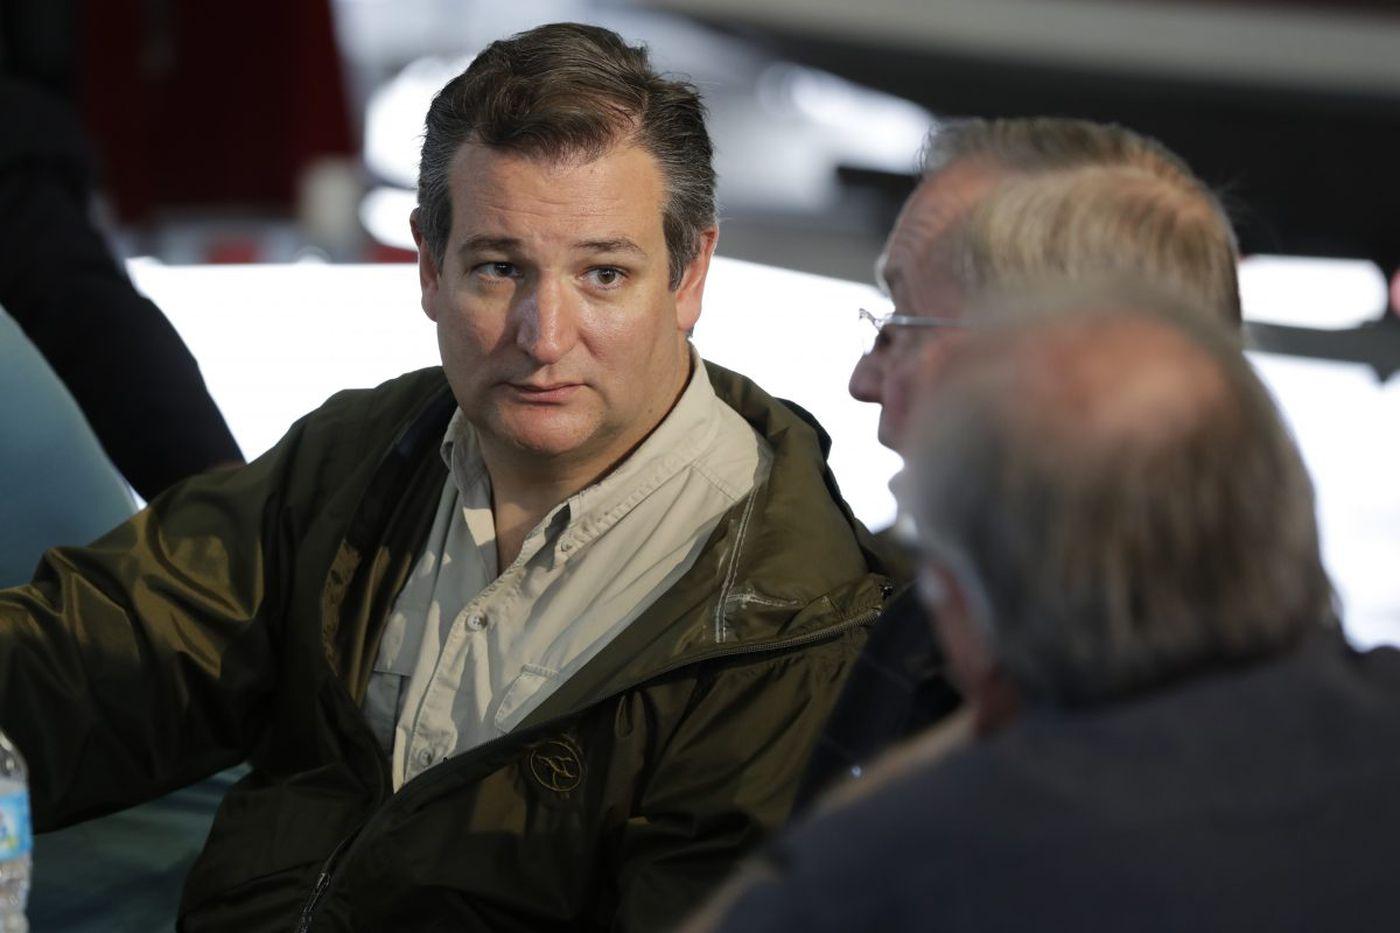 FactCheck: Cruz wrong on Sandy relief